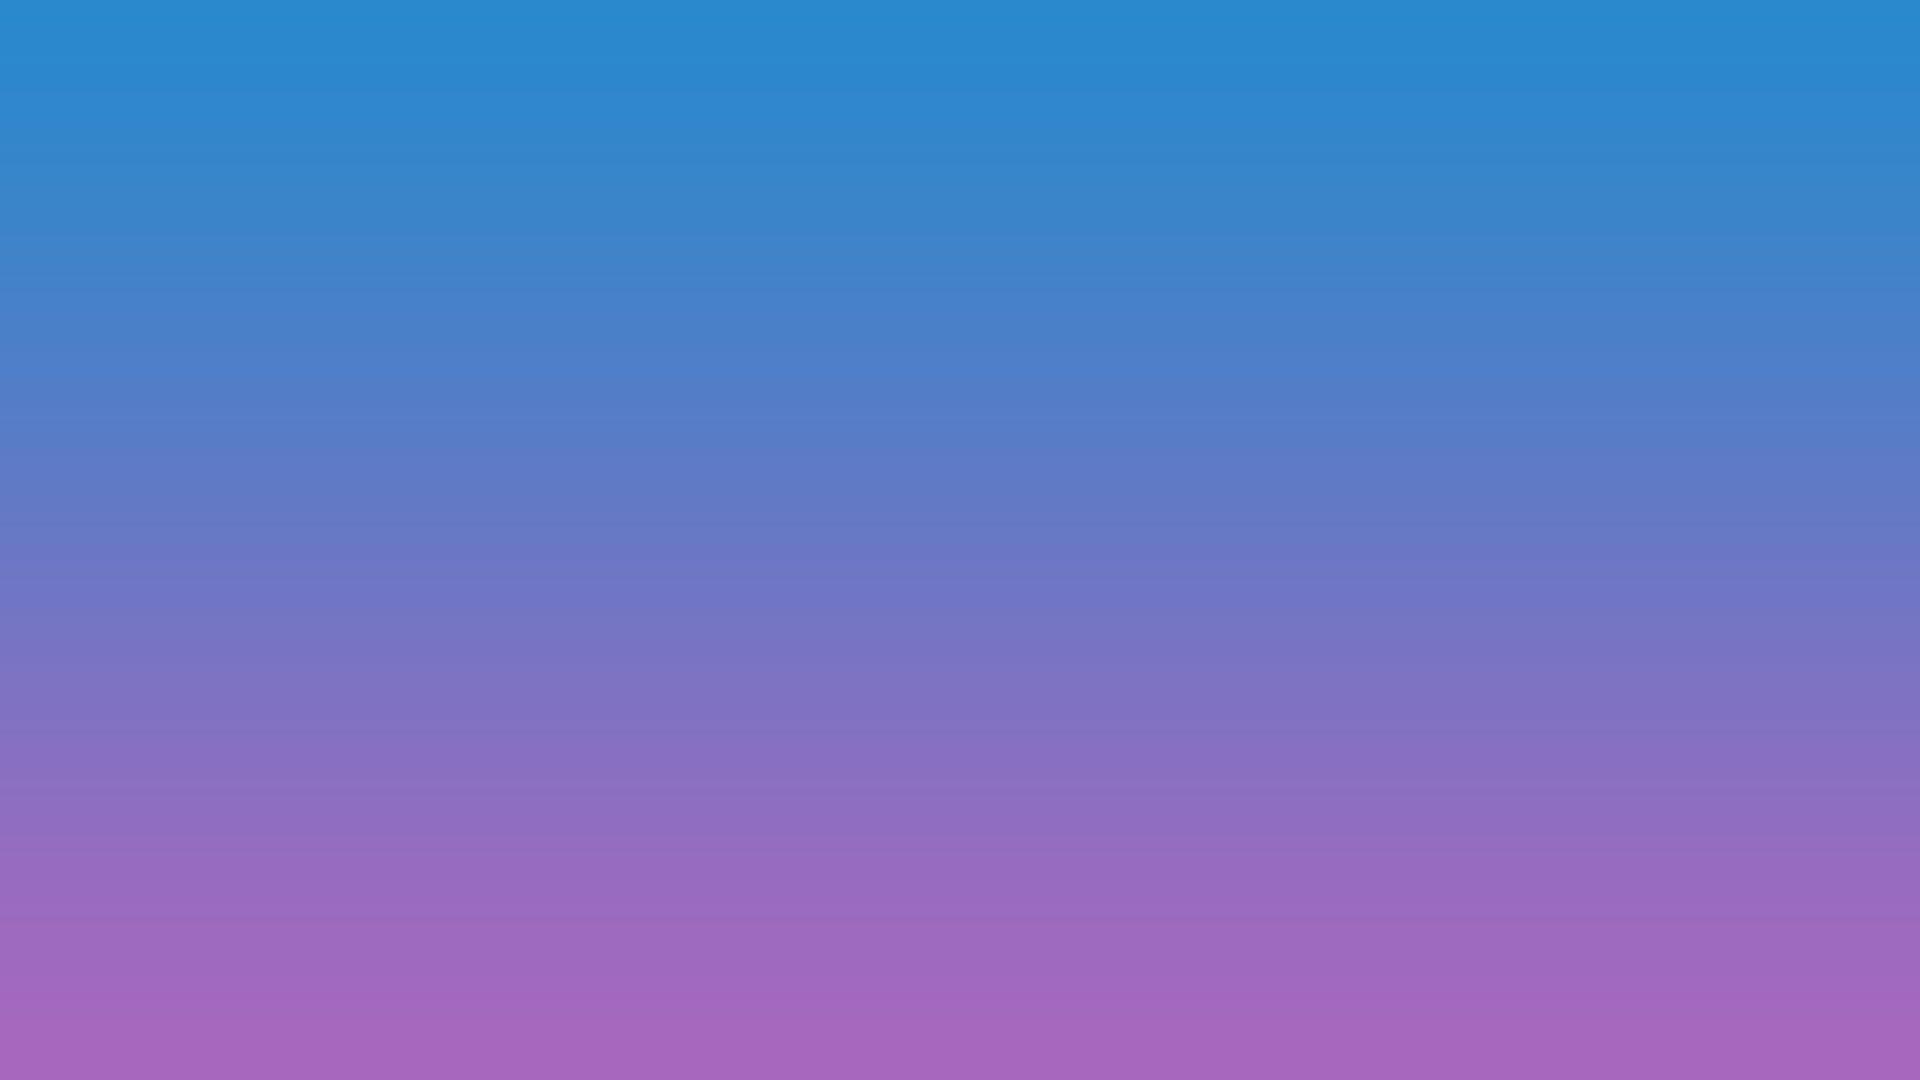 1920x1080 Dark Pastel Purple Solid Color Background